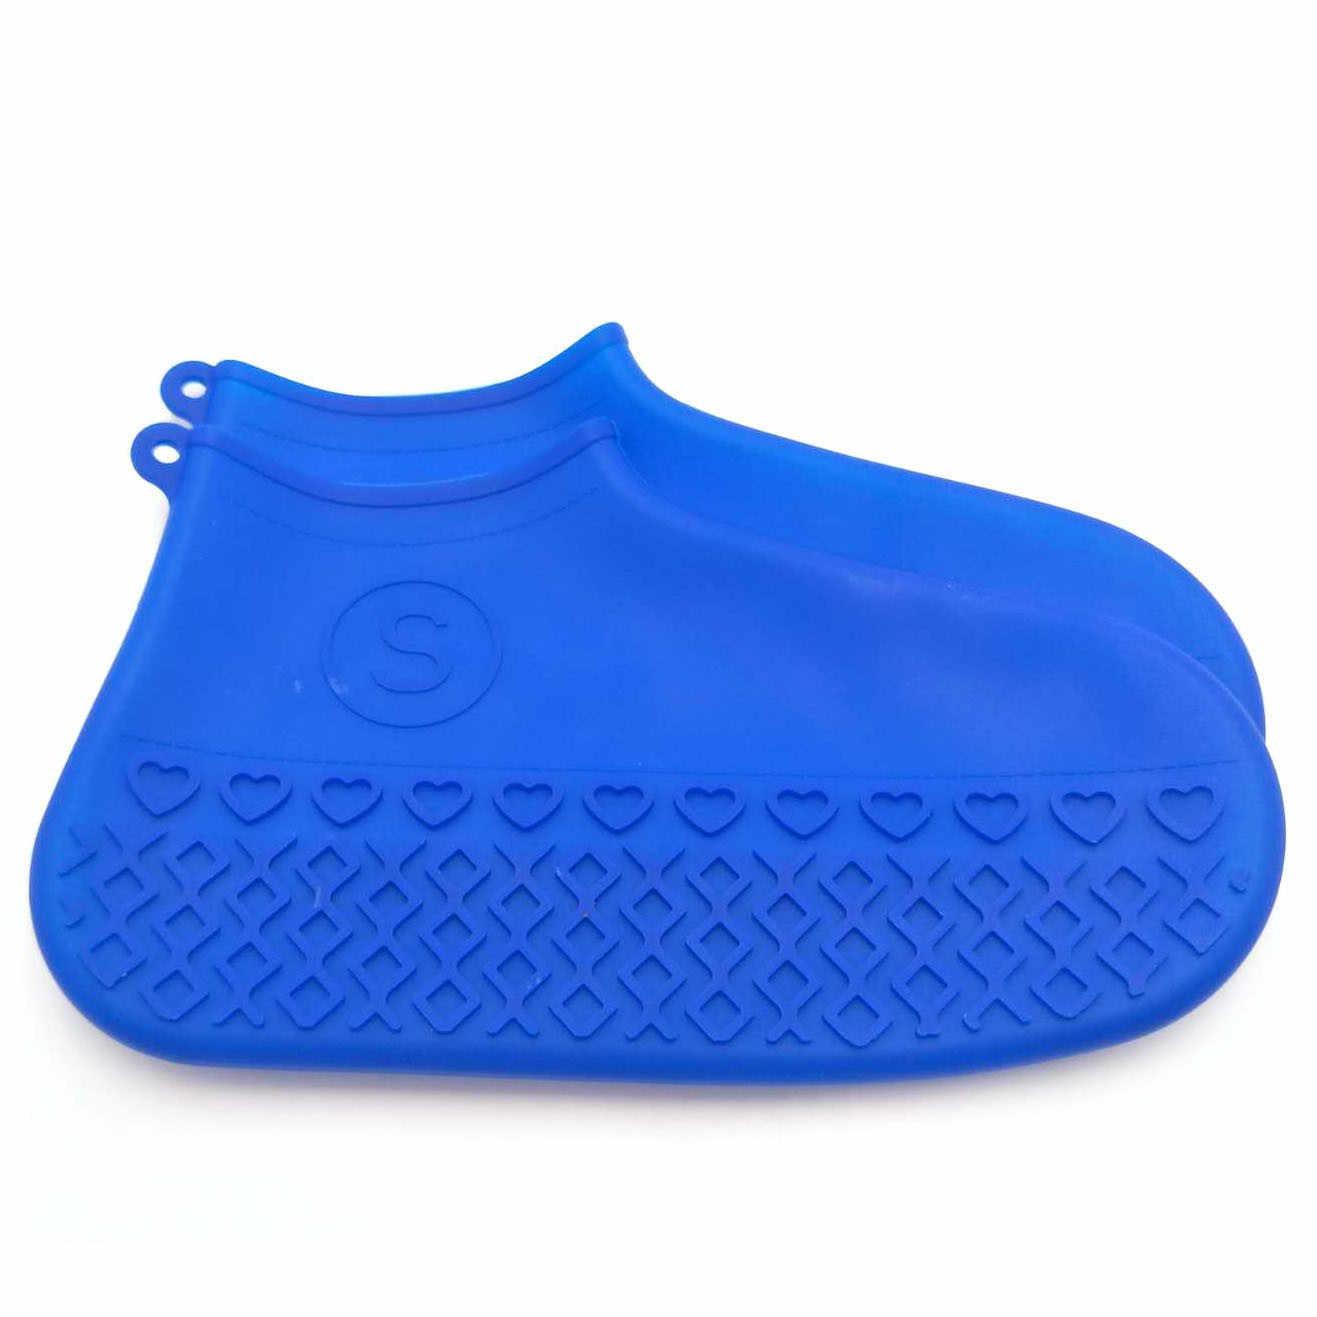 Zapatos de silicona reciclables reutilizables impermeables a prueba de agua para hombre fundas para Botas de lluvia antideslizantes lavables 6 colores S/M /L